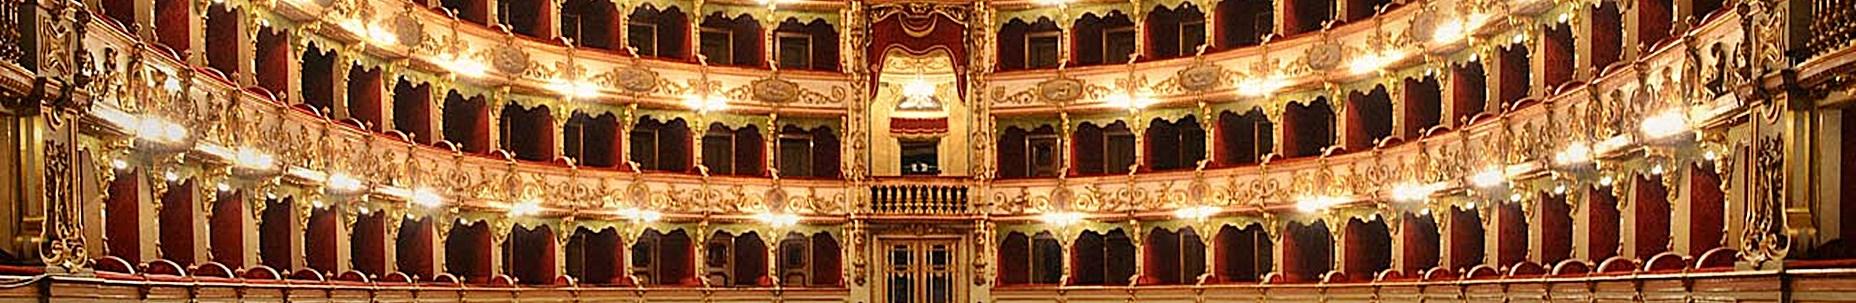 Sala teatro ópera